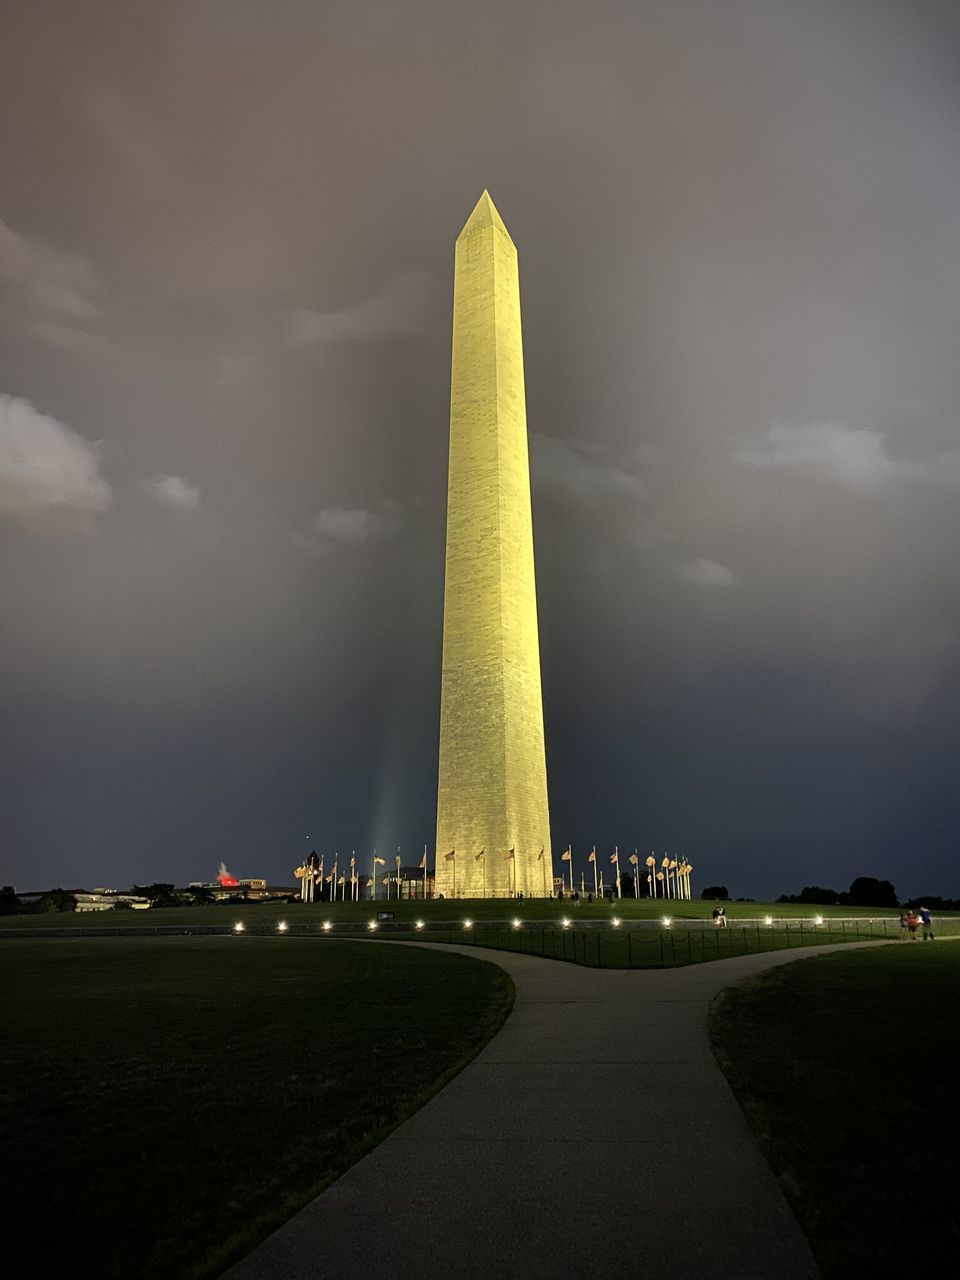 MONUMENT AGAINST CLOUDY SKY